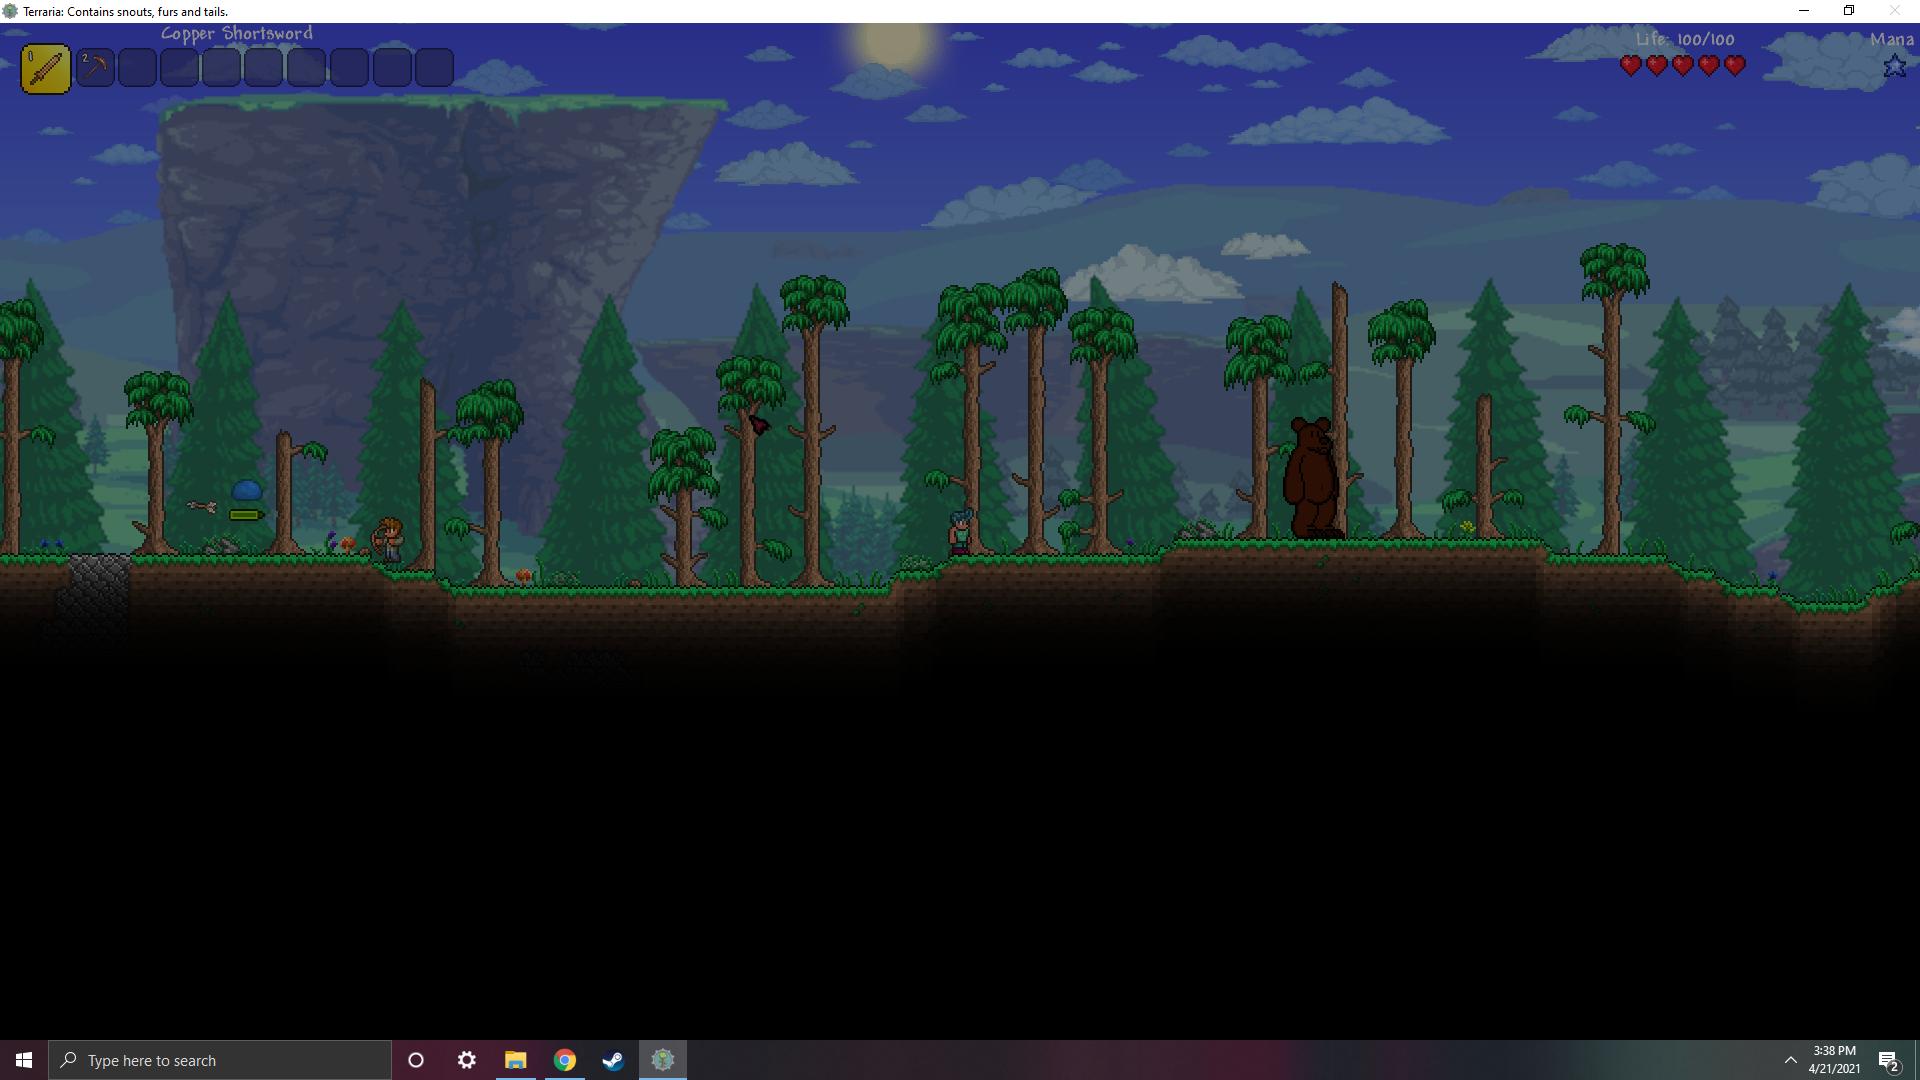 Desktop Screenshot 2021.04.21 - 15.38.52.28.png